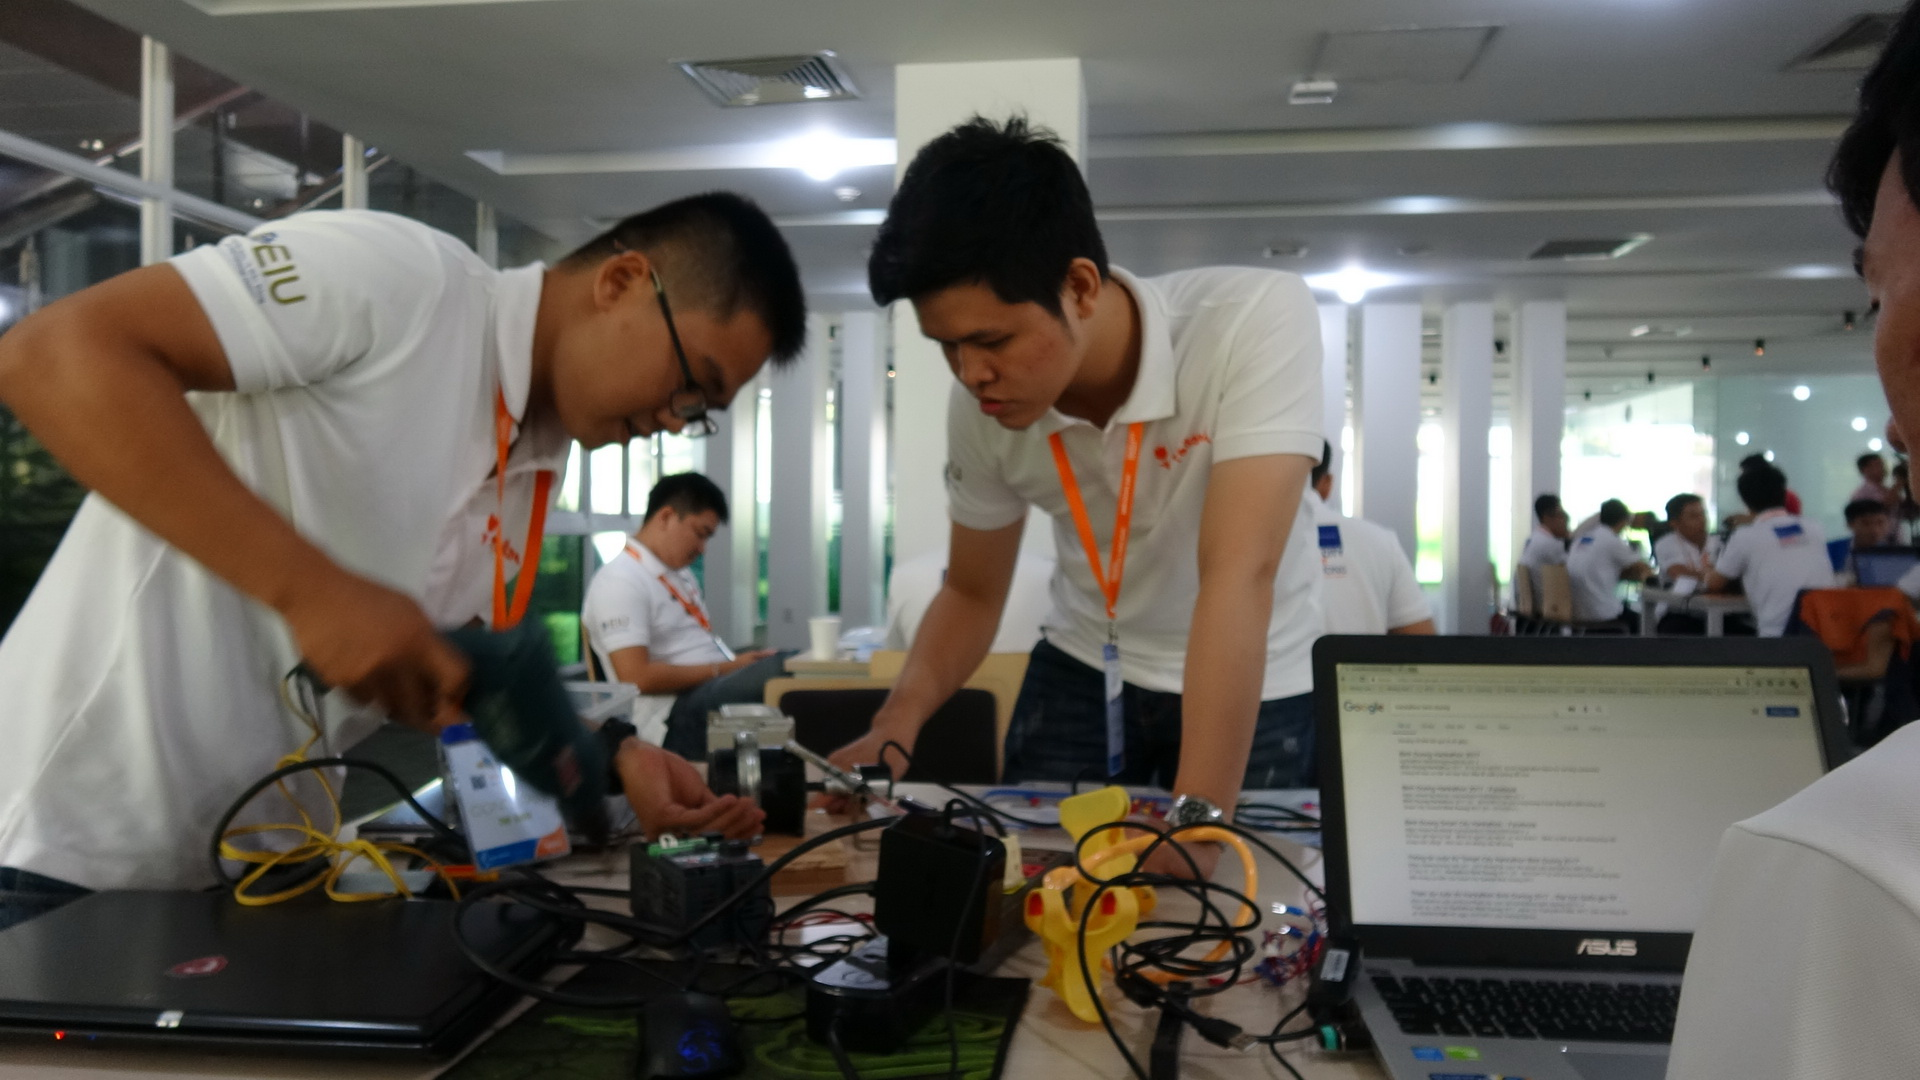 Binh Duong accelerates development of smart city